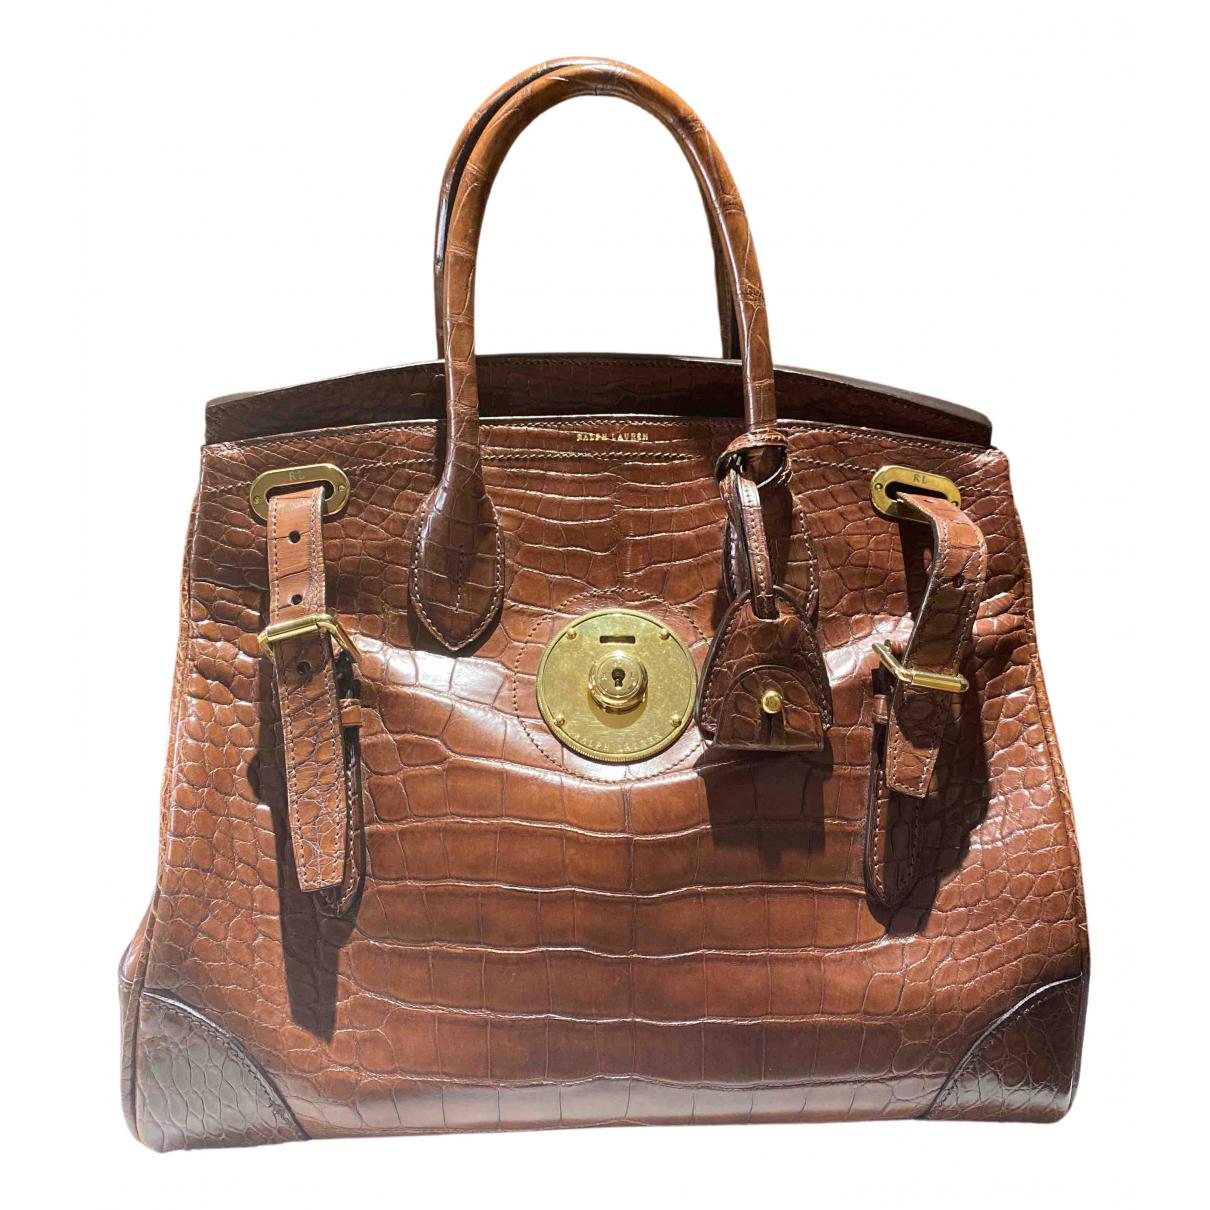 Ralph Lauren \N Handtasche in  Braun Aligator